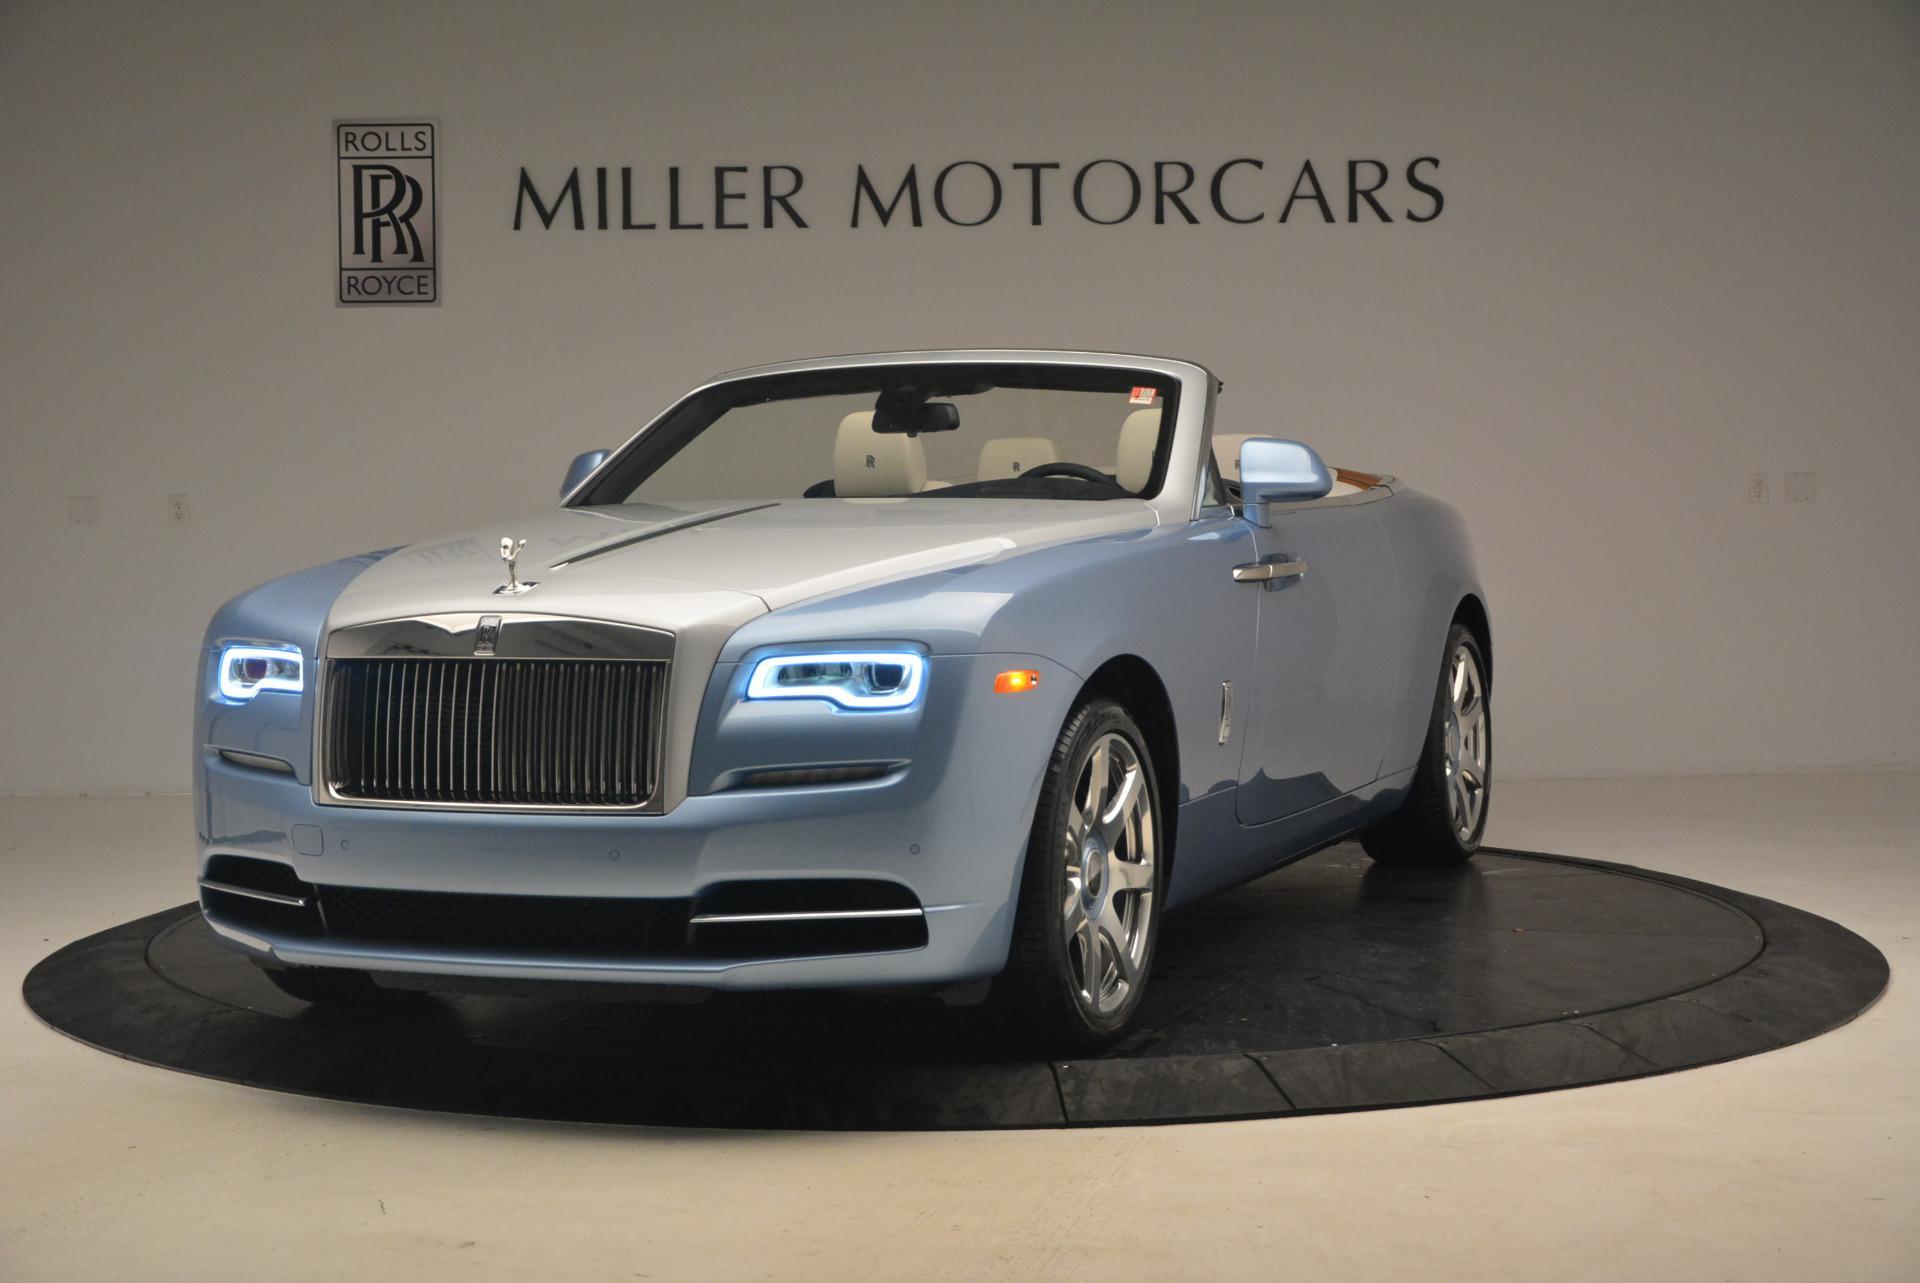 New 2017 Rolls-Royce Dawn for sale Sold at Alfa Romeo of Westport in Westport CT 06880 1